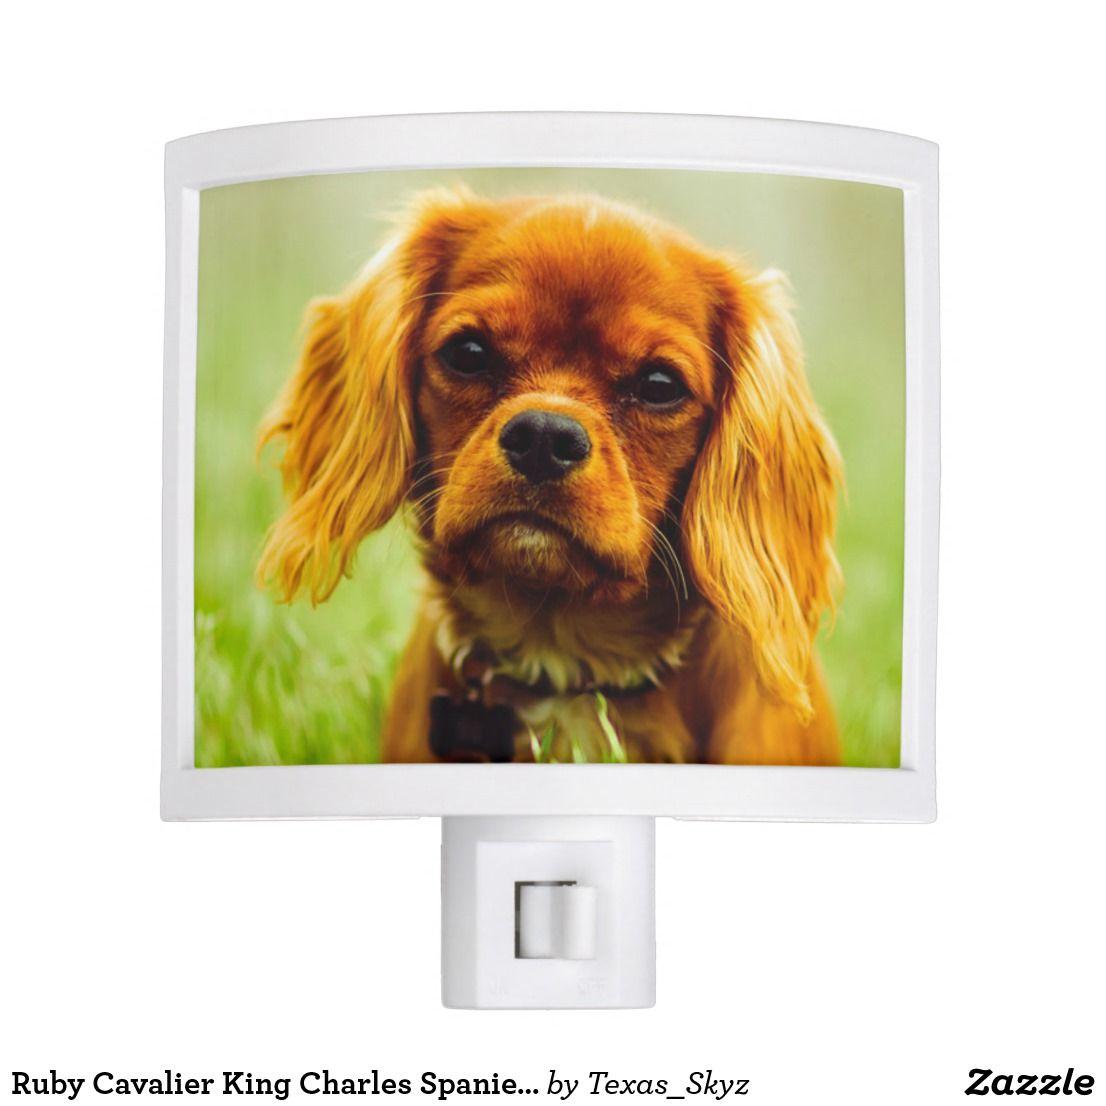 Ruby Cavalier King Charles Spaniel Puppy Dog Night Light Zazzle Com Ruby Cavalier King Charles Spaniel Puppy King Charles Cavalier Spaniel Puppy Cavalier King Charles Spaniel